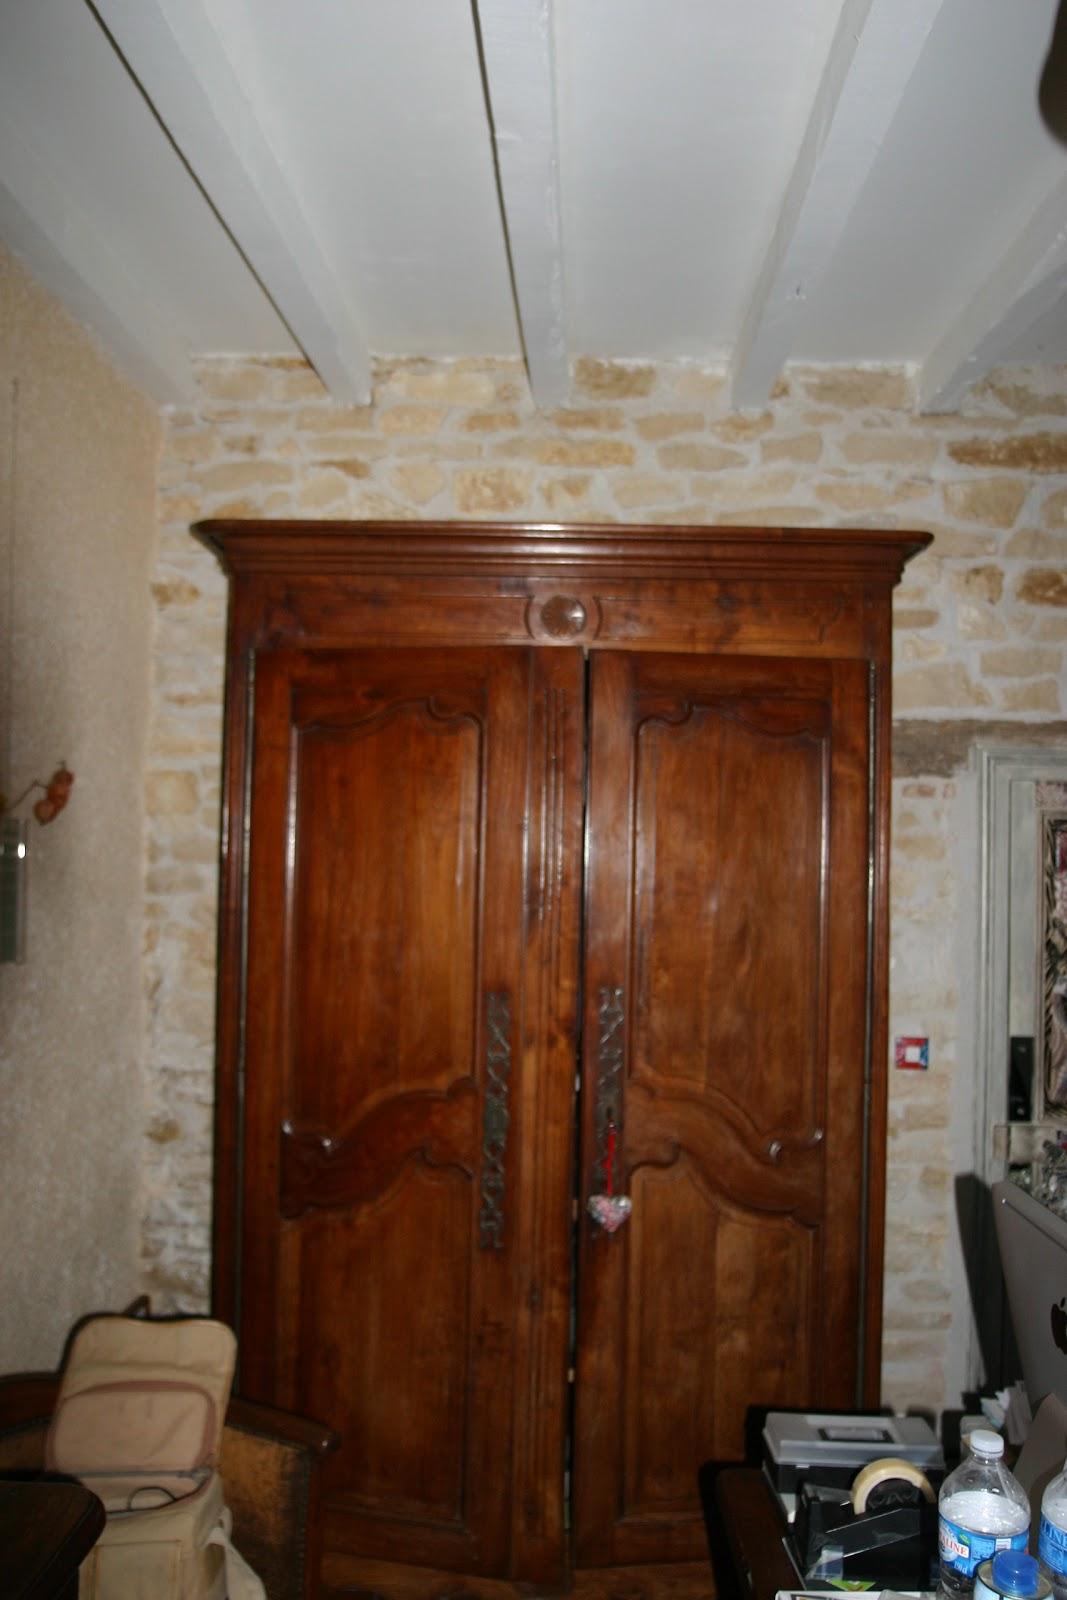 Brocante d 39 hier et d 39 aujourd 39 hui armoire normande - Brocante 95 aujourd hui ...